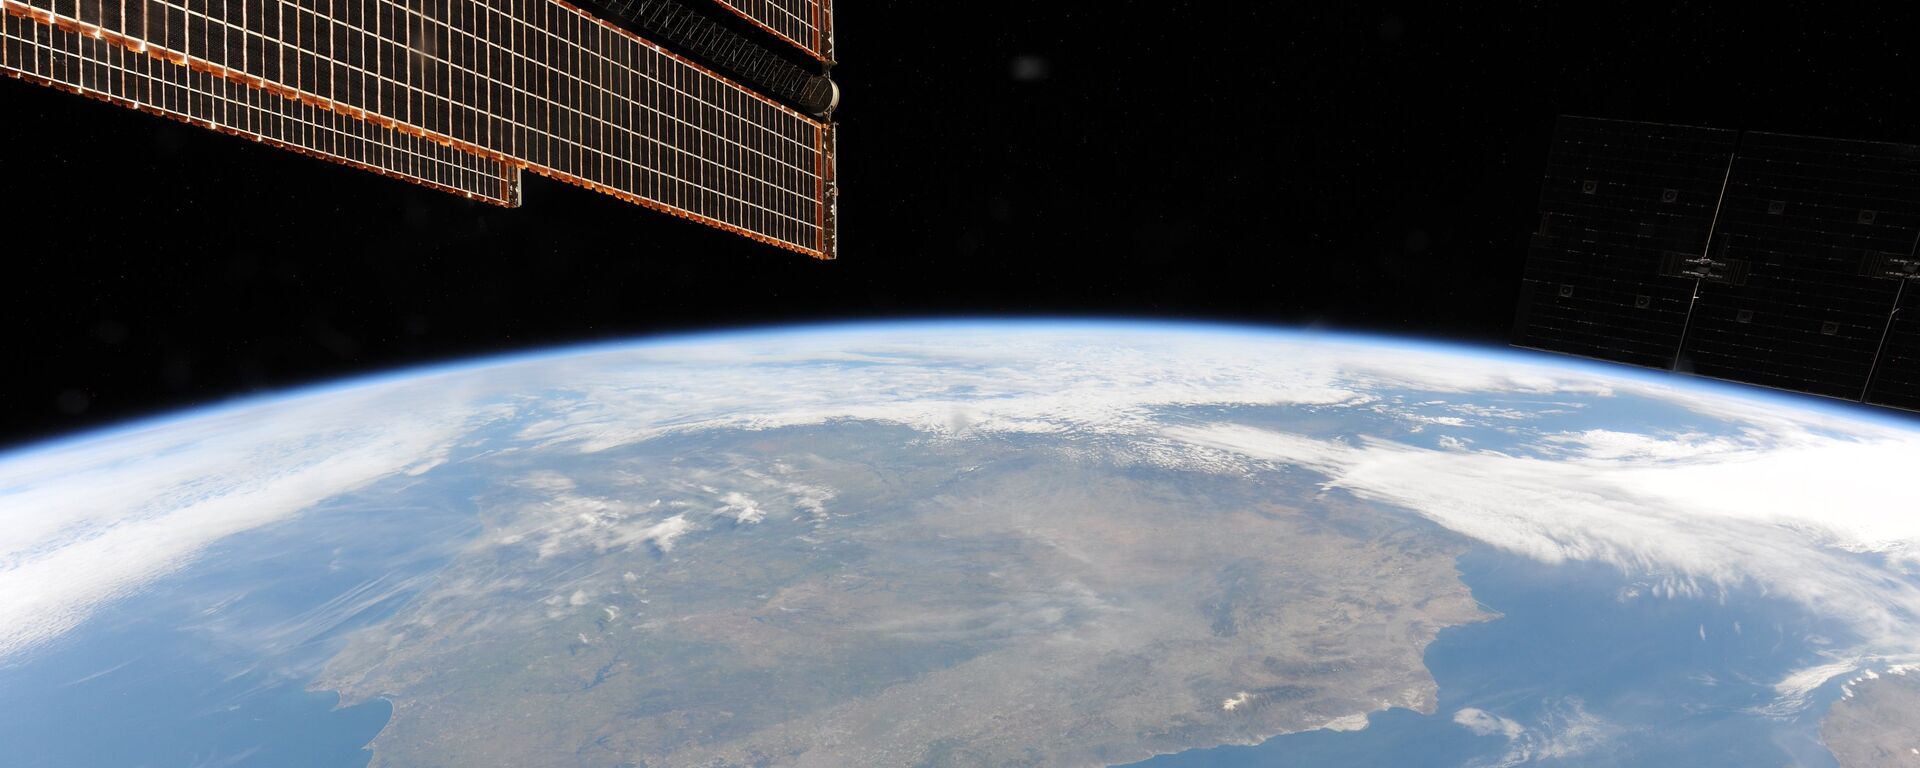 La terra vista dallo spazio - Sputnik Italia, 1920, 25.03.2021